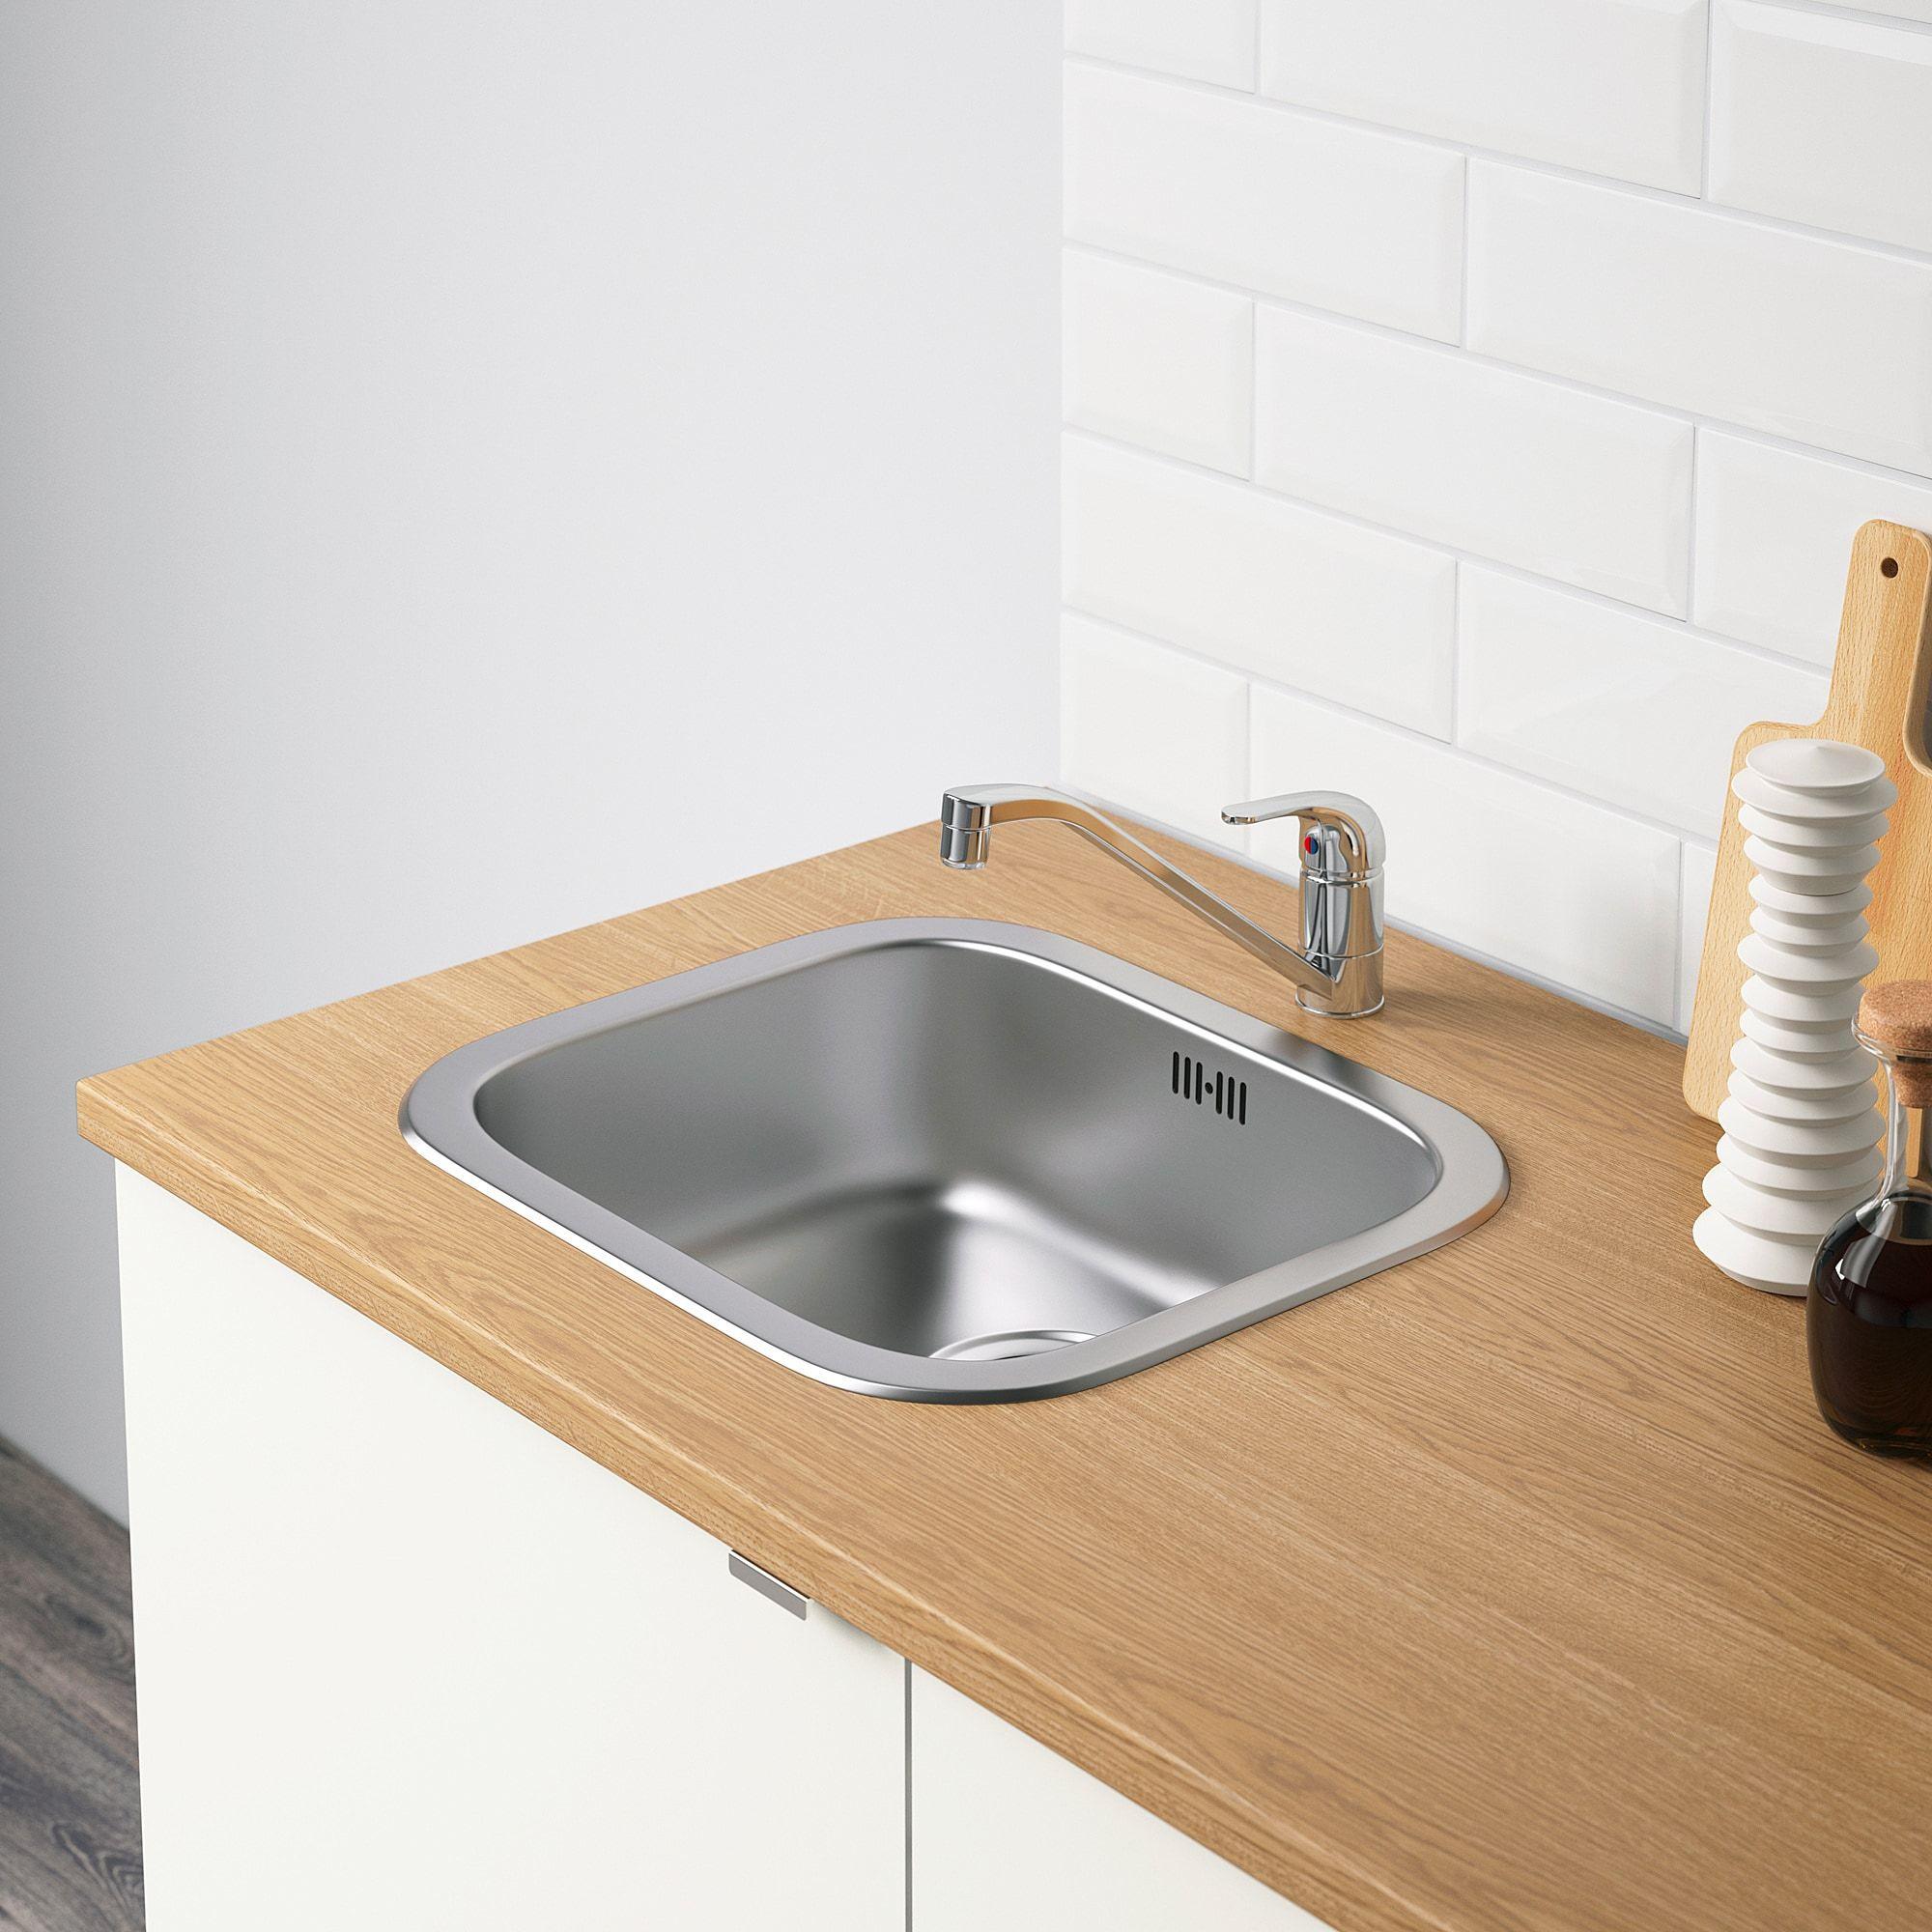 Knoxhult Kuhinja Bela Ikea In 2020 Base Cabinets Laminate Worktop Kitchen Remodel Countertops